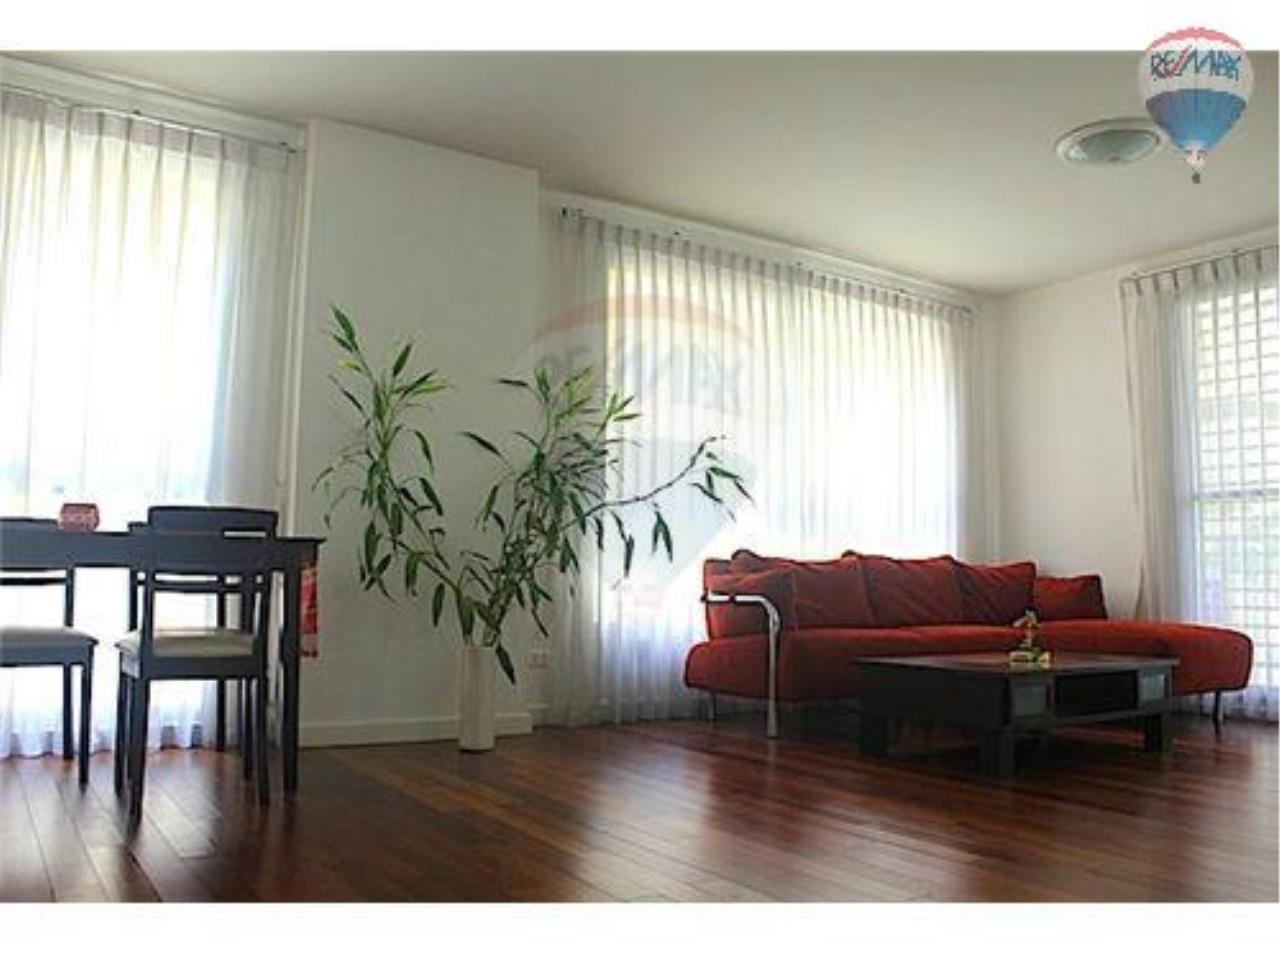 RE/MAX Properties Agency's 2 Bedroom Apartment- Sukhumvit Soi 49 2